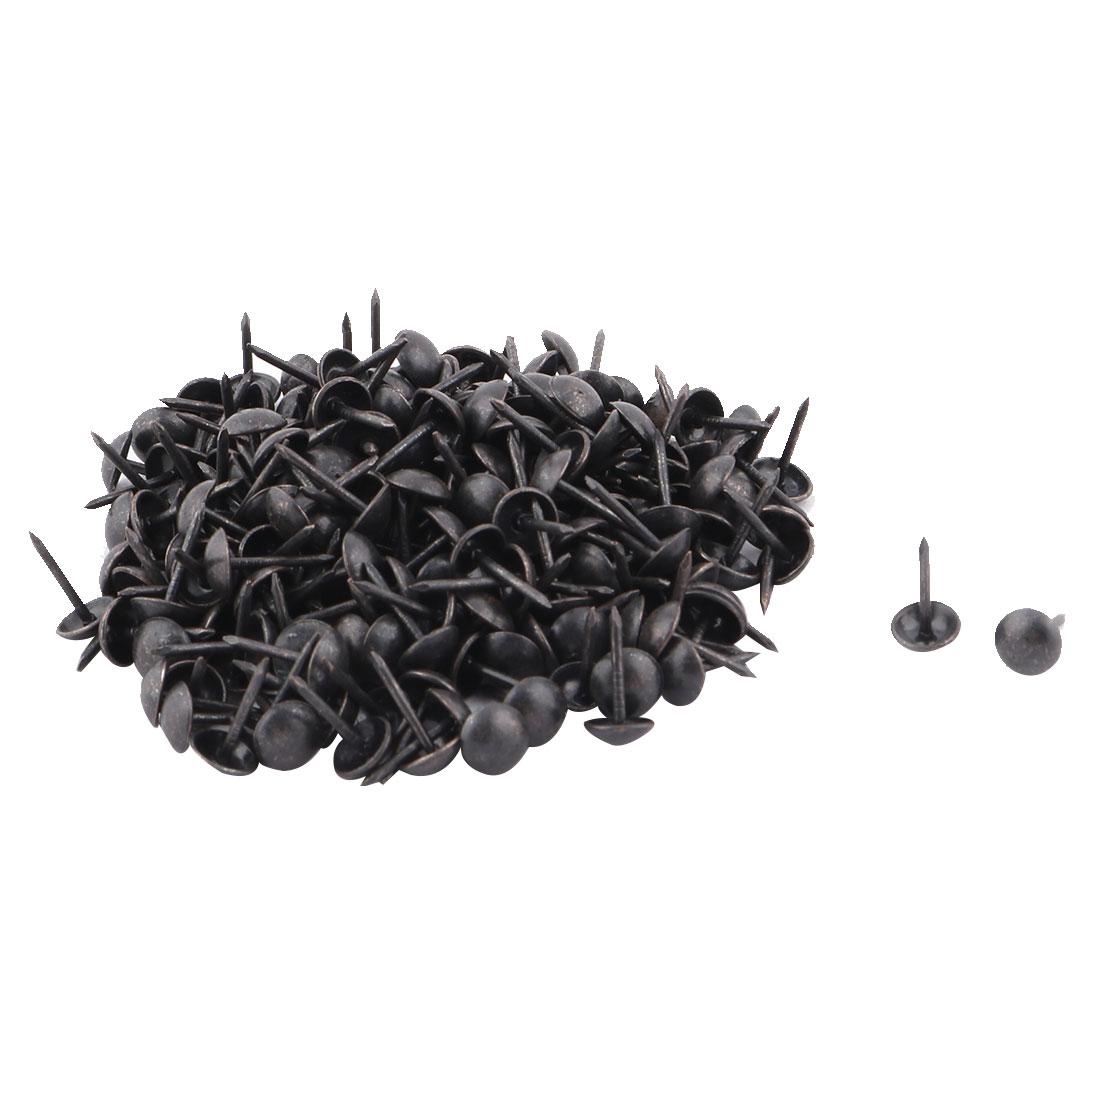 Table Chair Metal Round Head Thumb Tack Nail Pushpin Black 7 x 13mm 200pcs